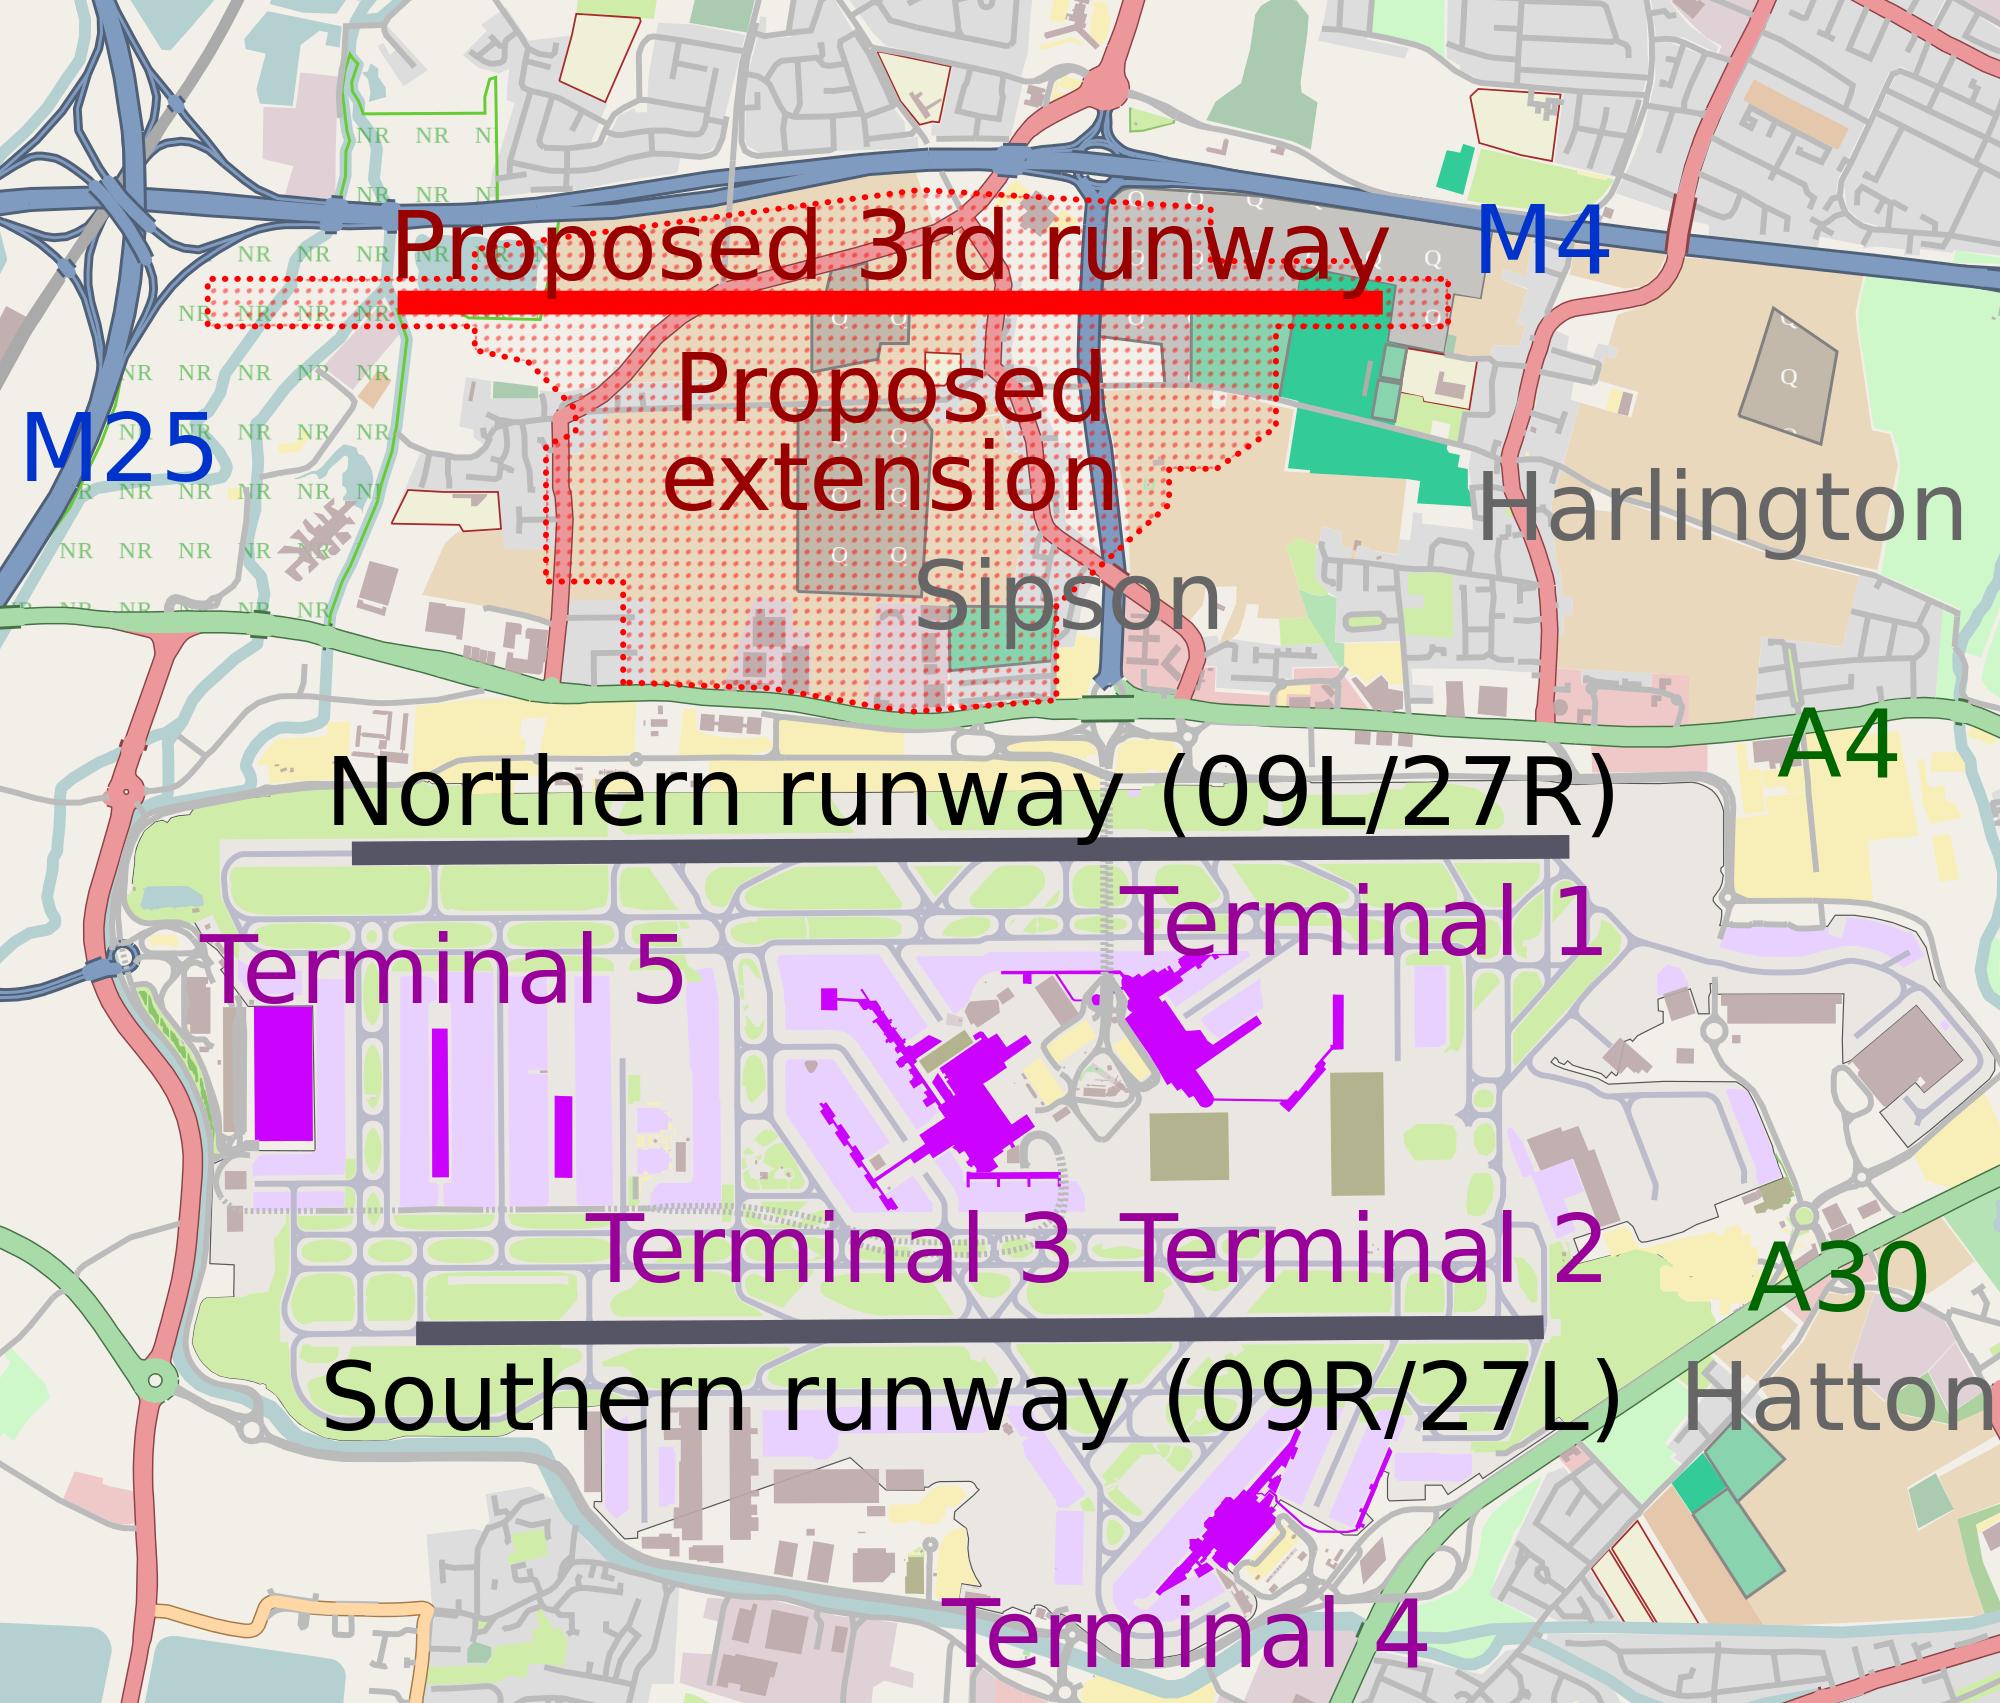 Heathrow, Airport, UK